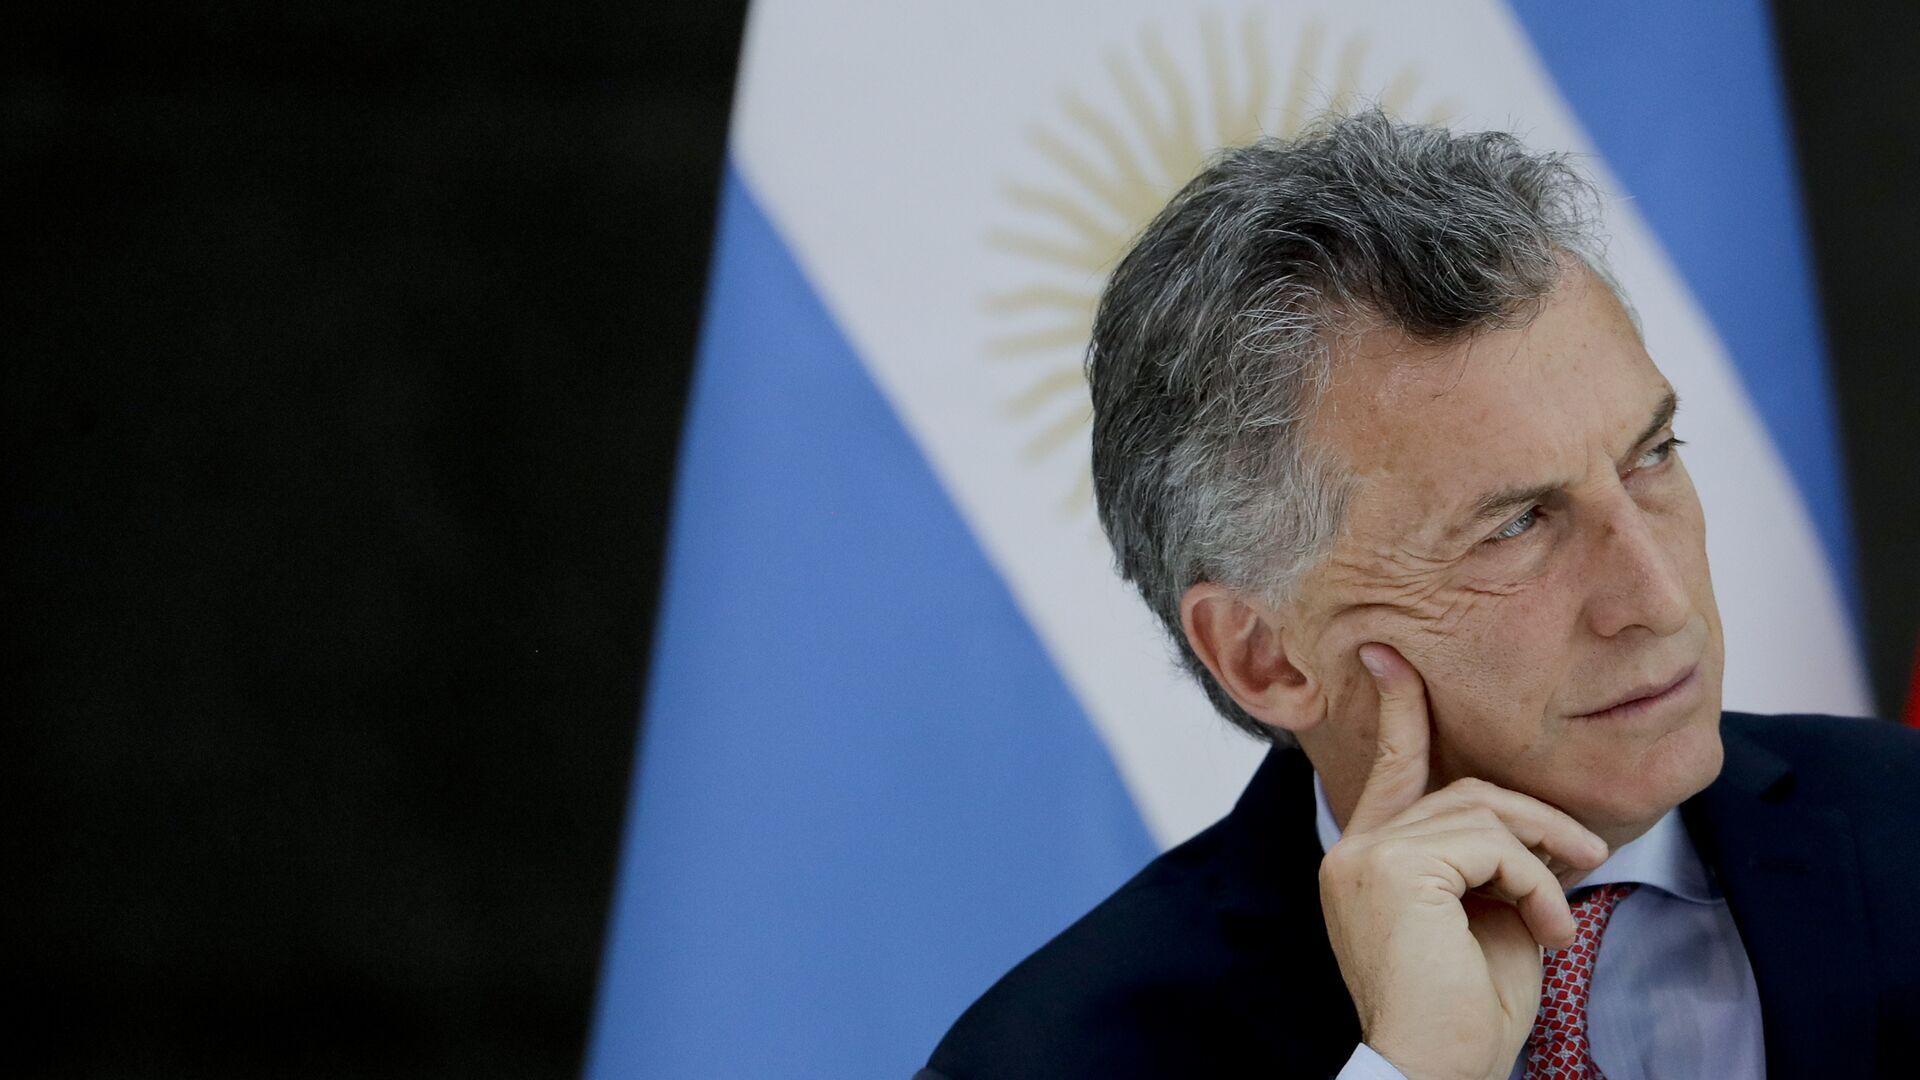 Mauricio Macri, presidente de Argentina - Sputnik Mundo, 1920, 01.06.2021